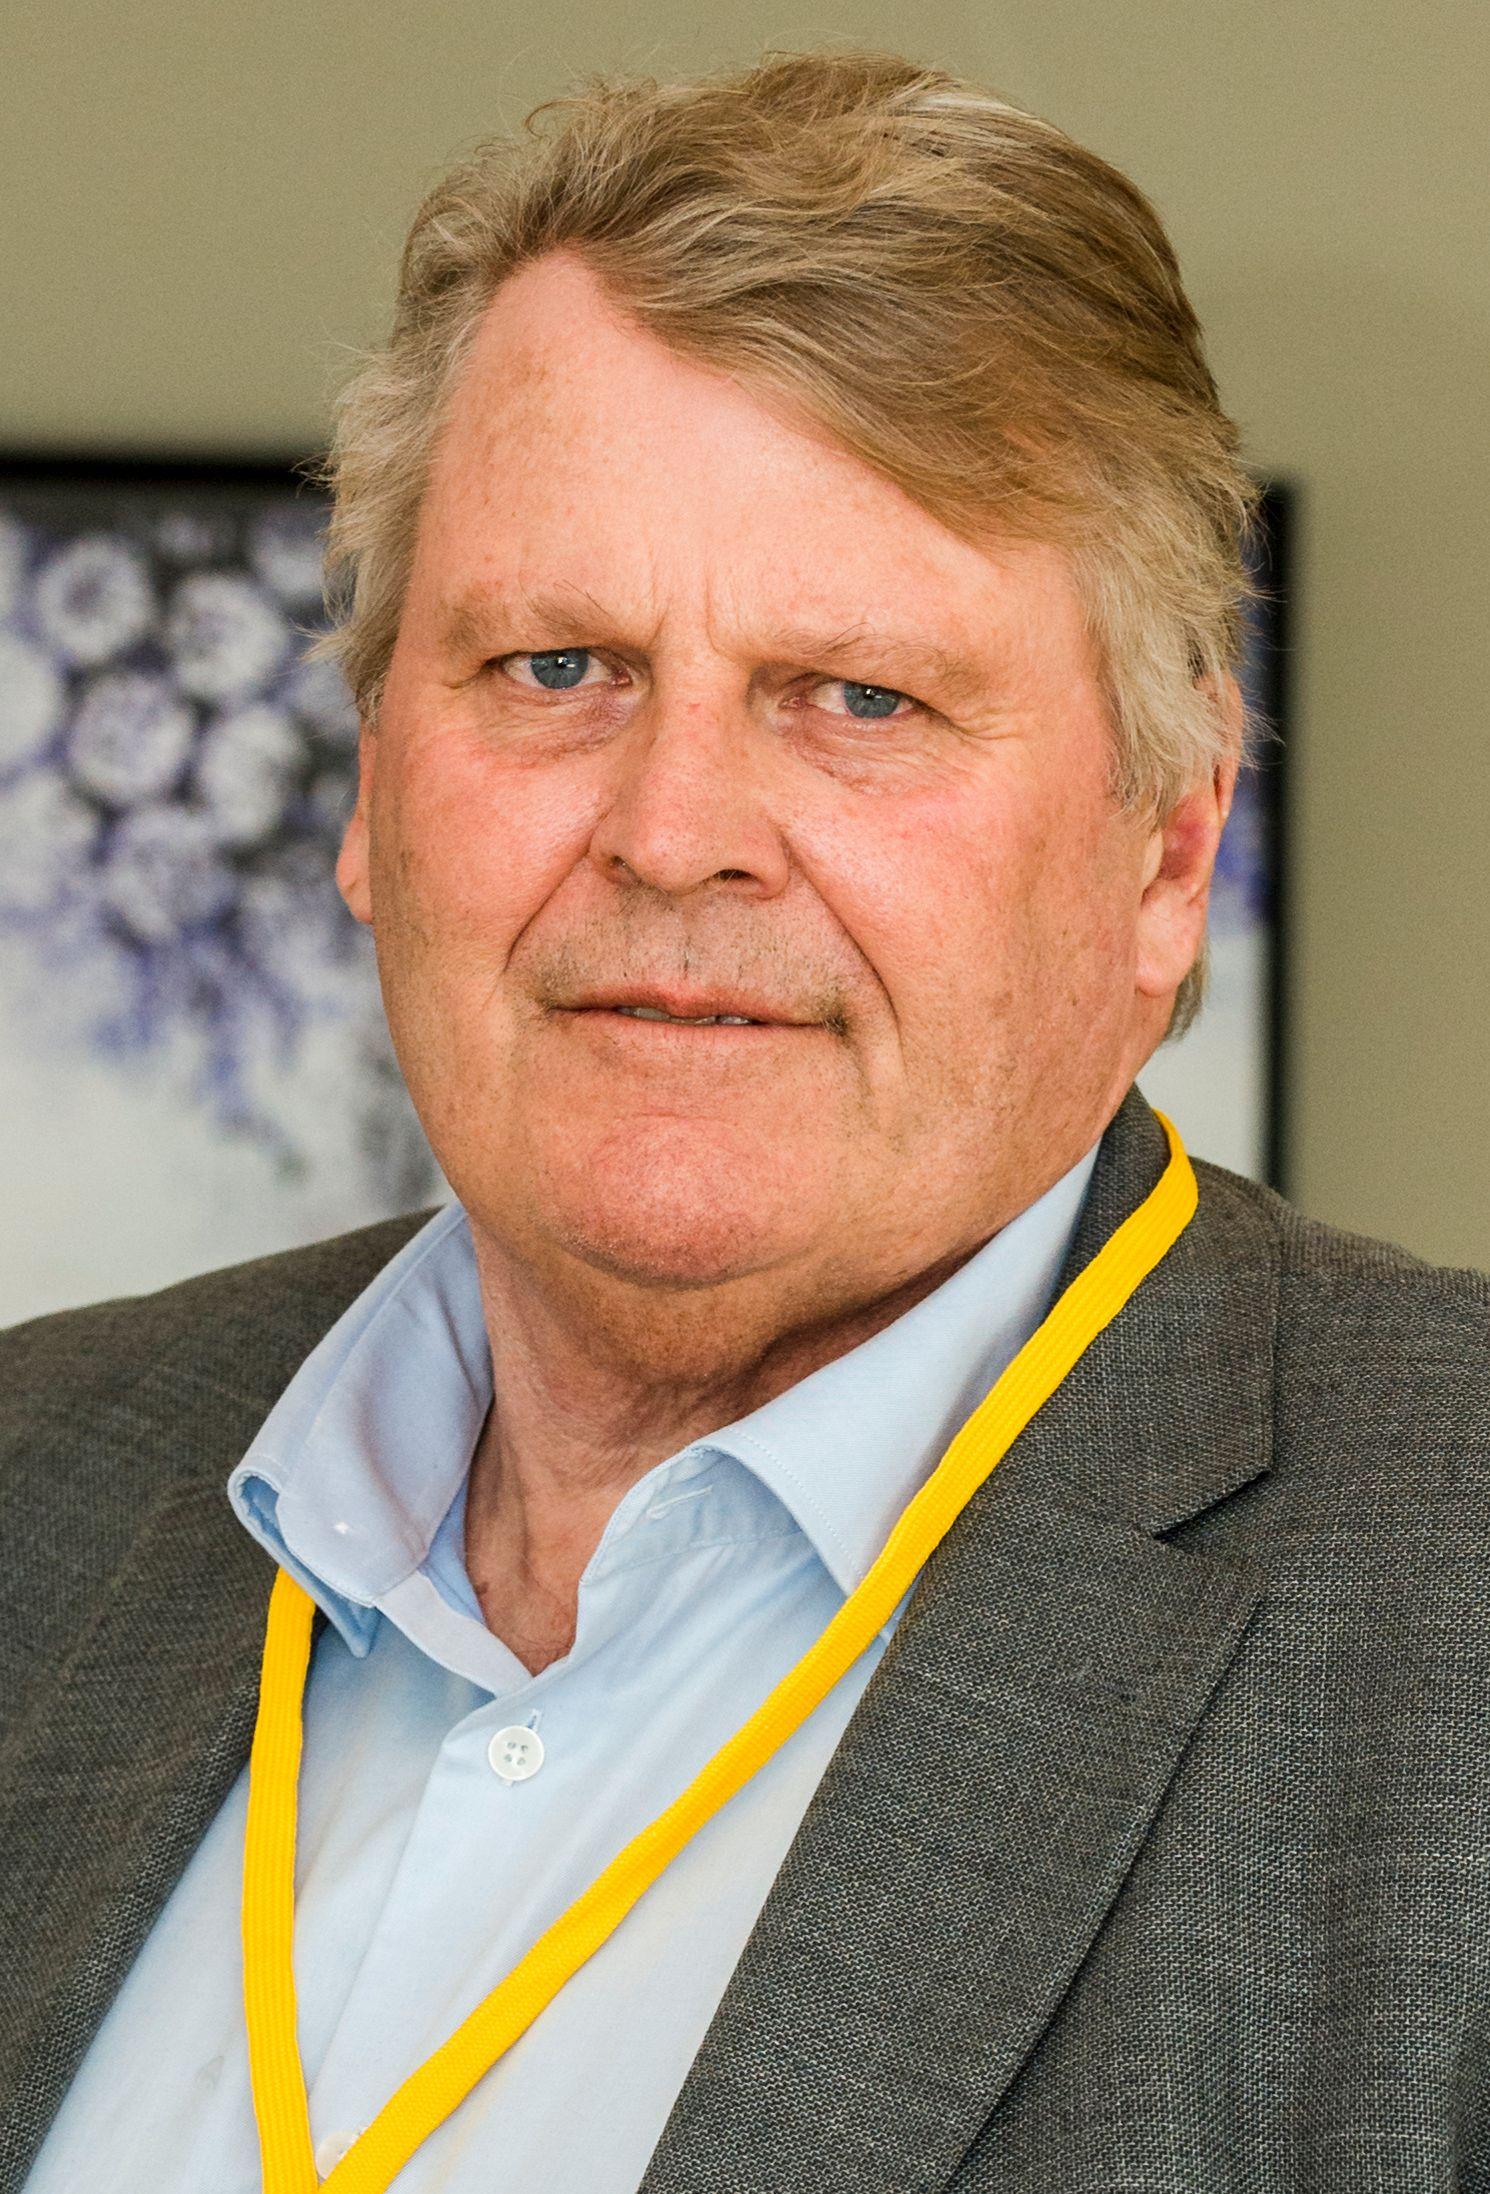 Hans Fredrik Grøvan